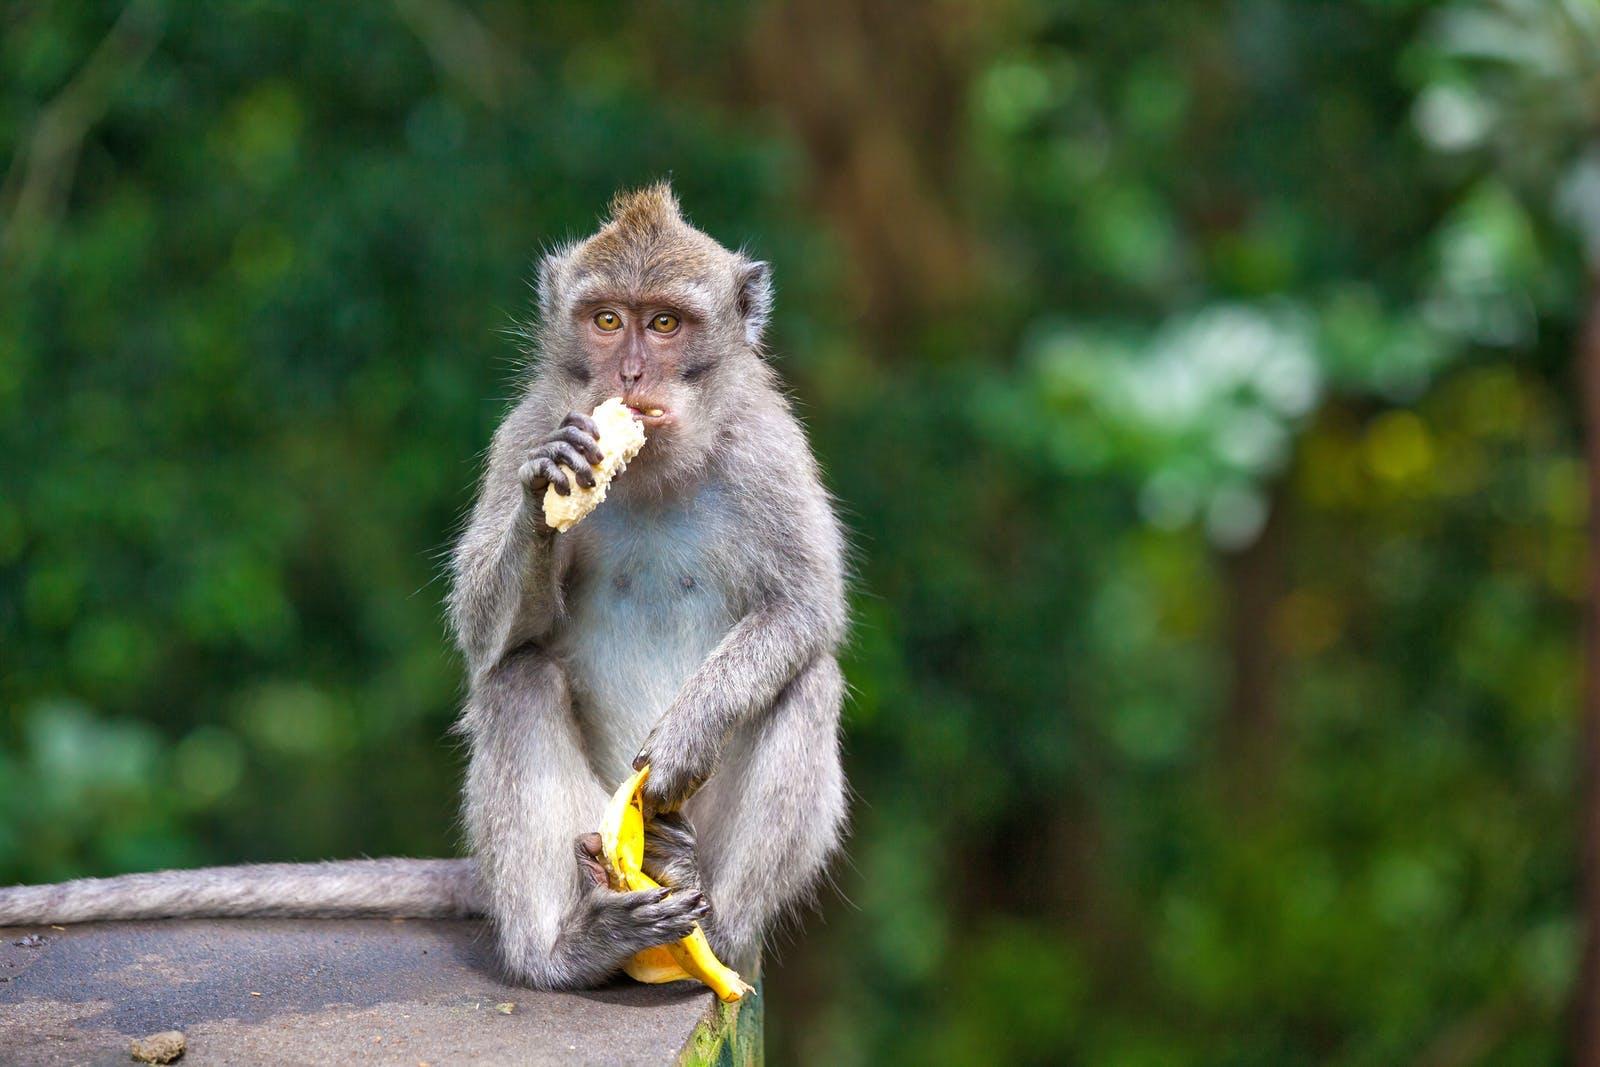 Melbourne Zoo slutar mata djuren med frukt